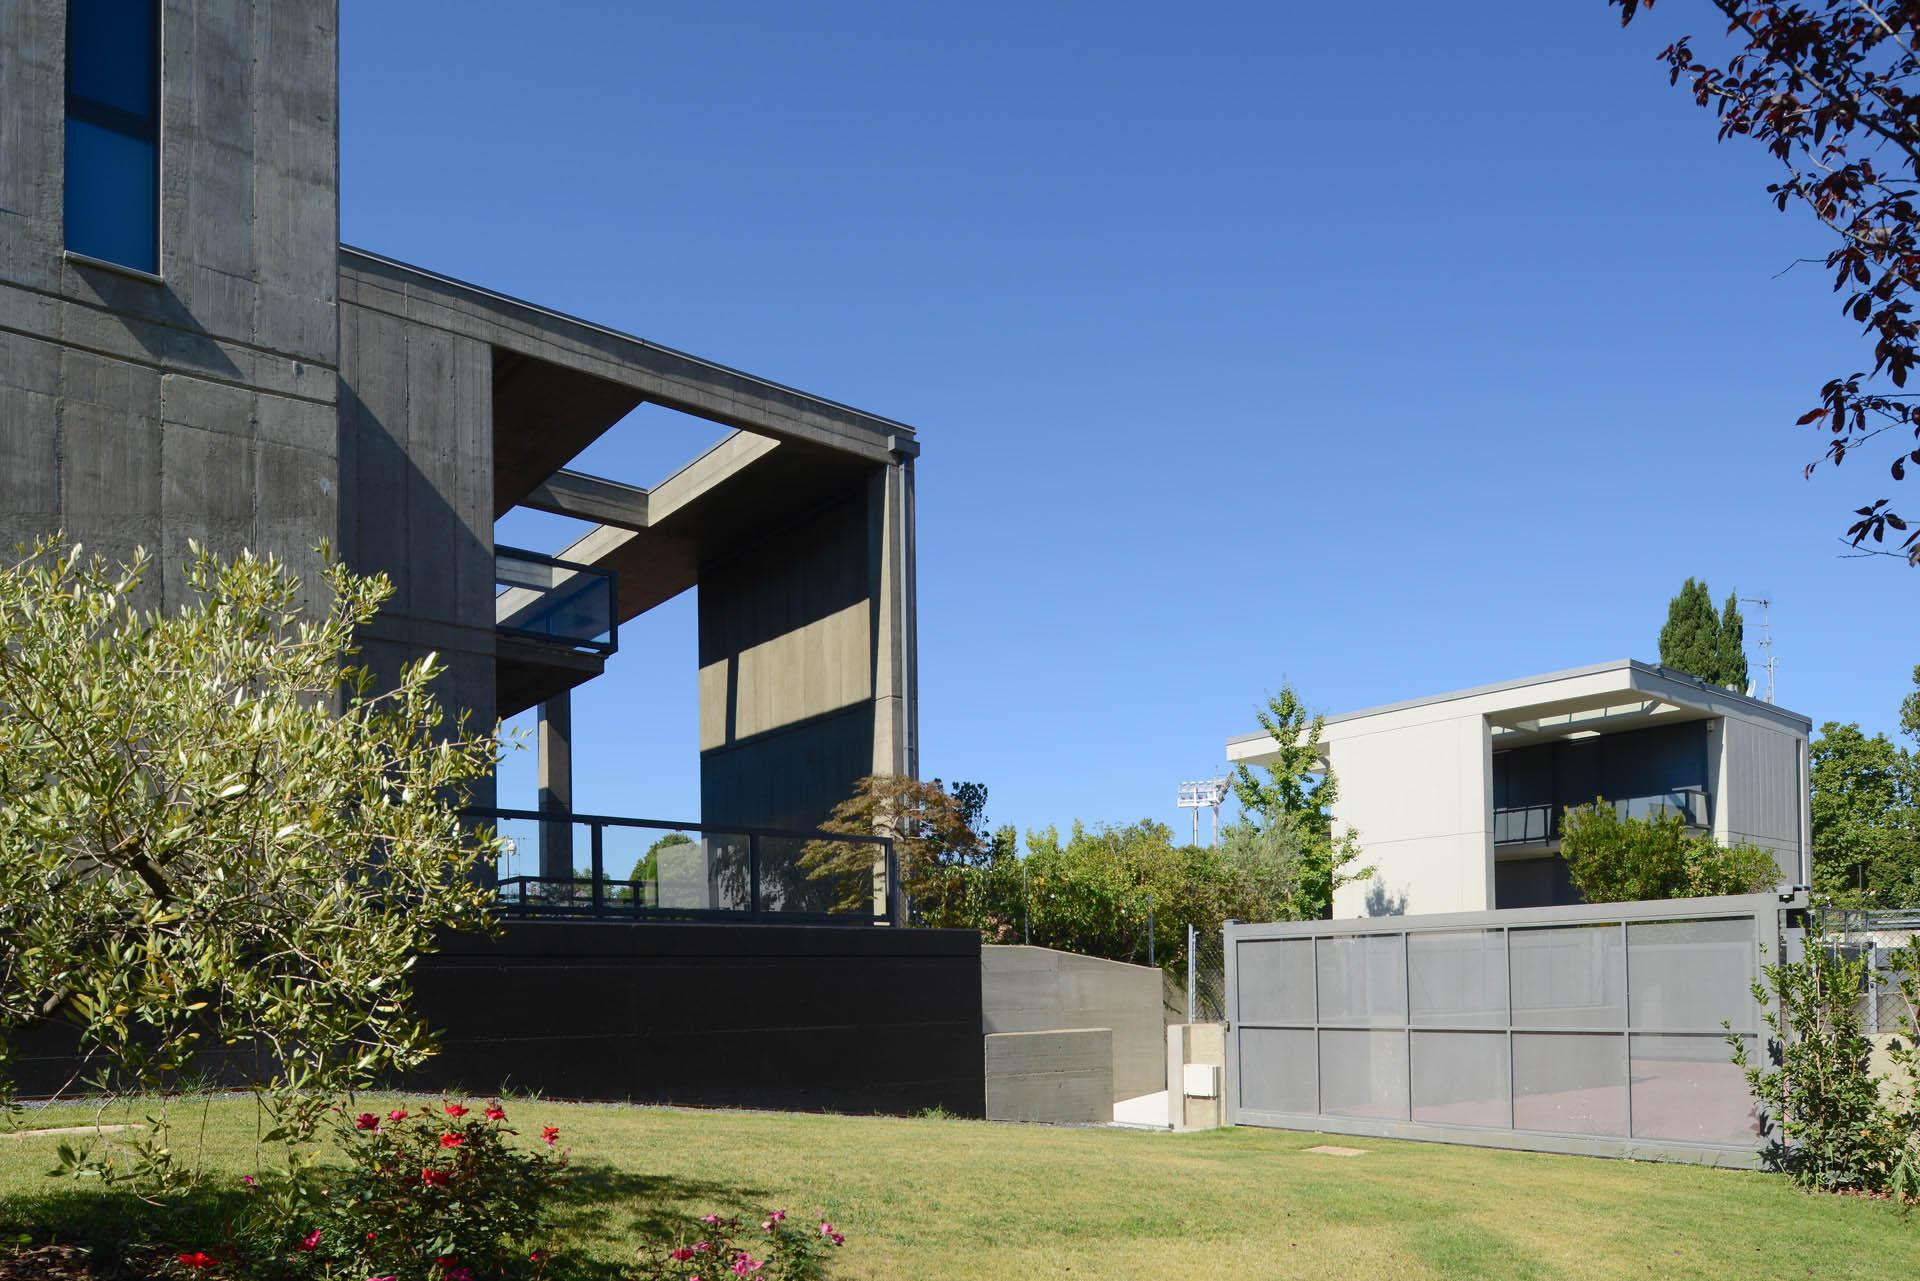 07 Studio Bacchi architetti associati casa 3 img 07